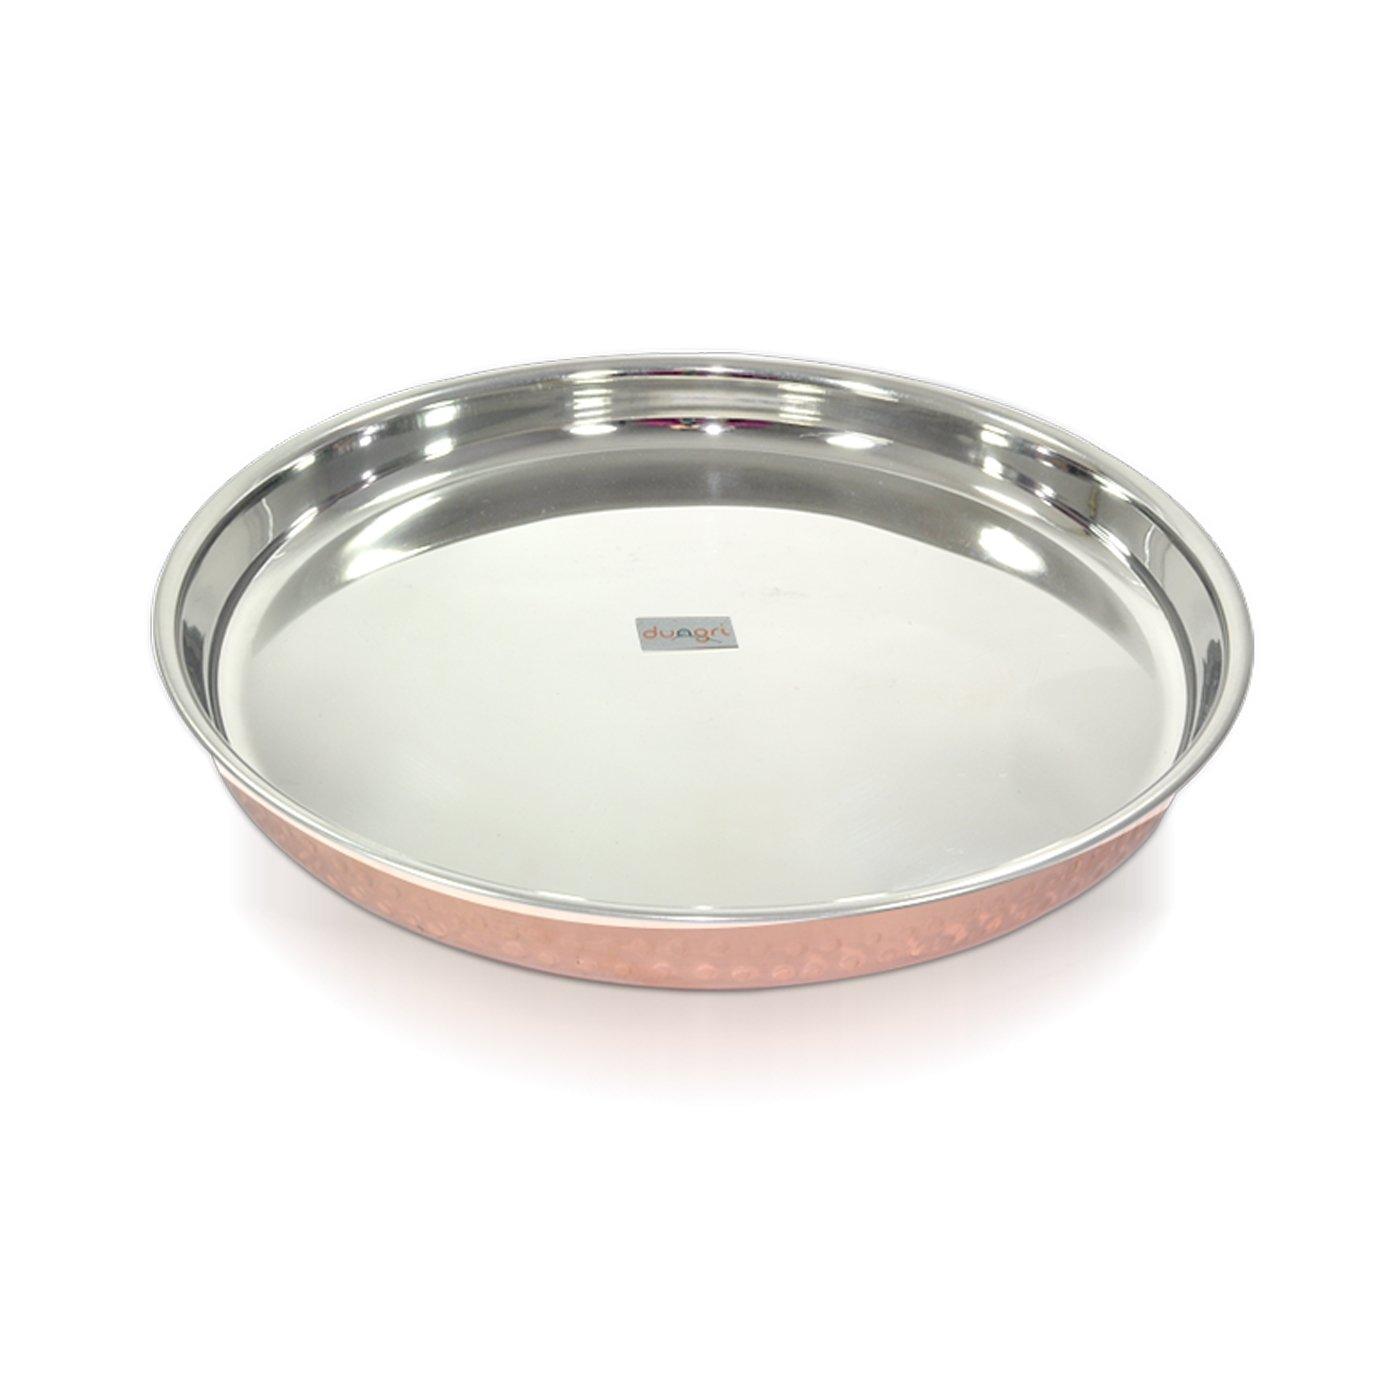 Dungri India Craft ® Indian Dinnerware Stainless Steel Copperware Thali - Diameter 12 Inch